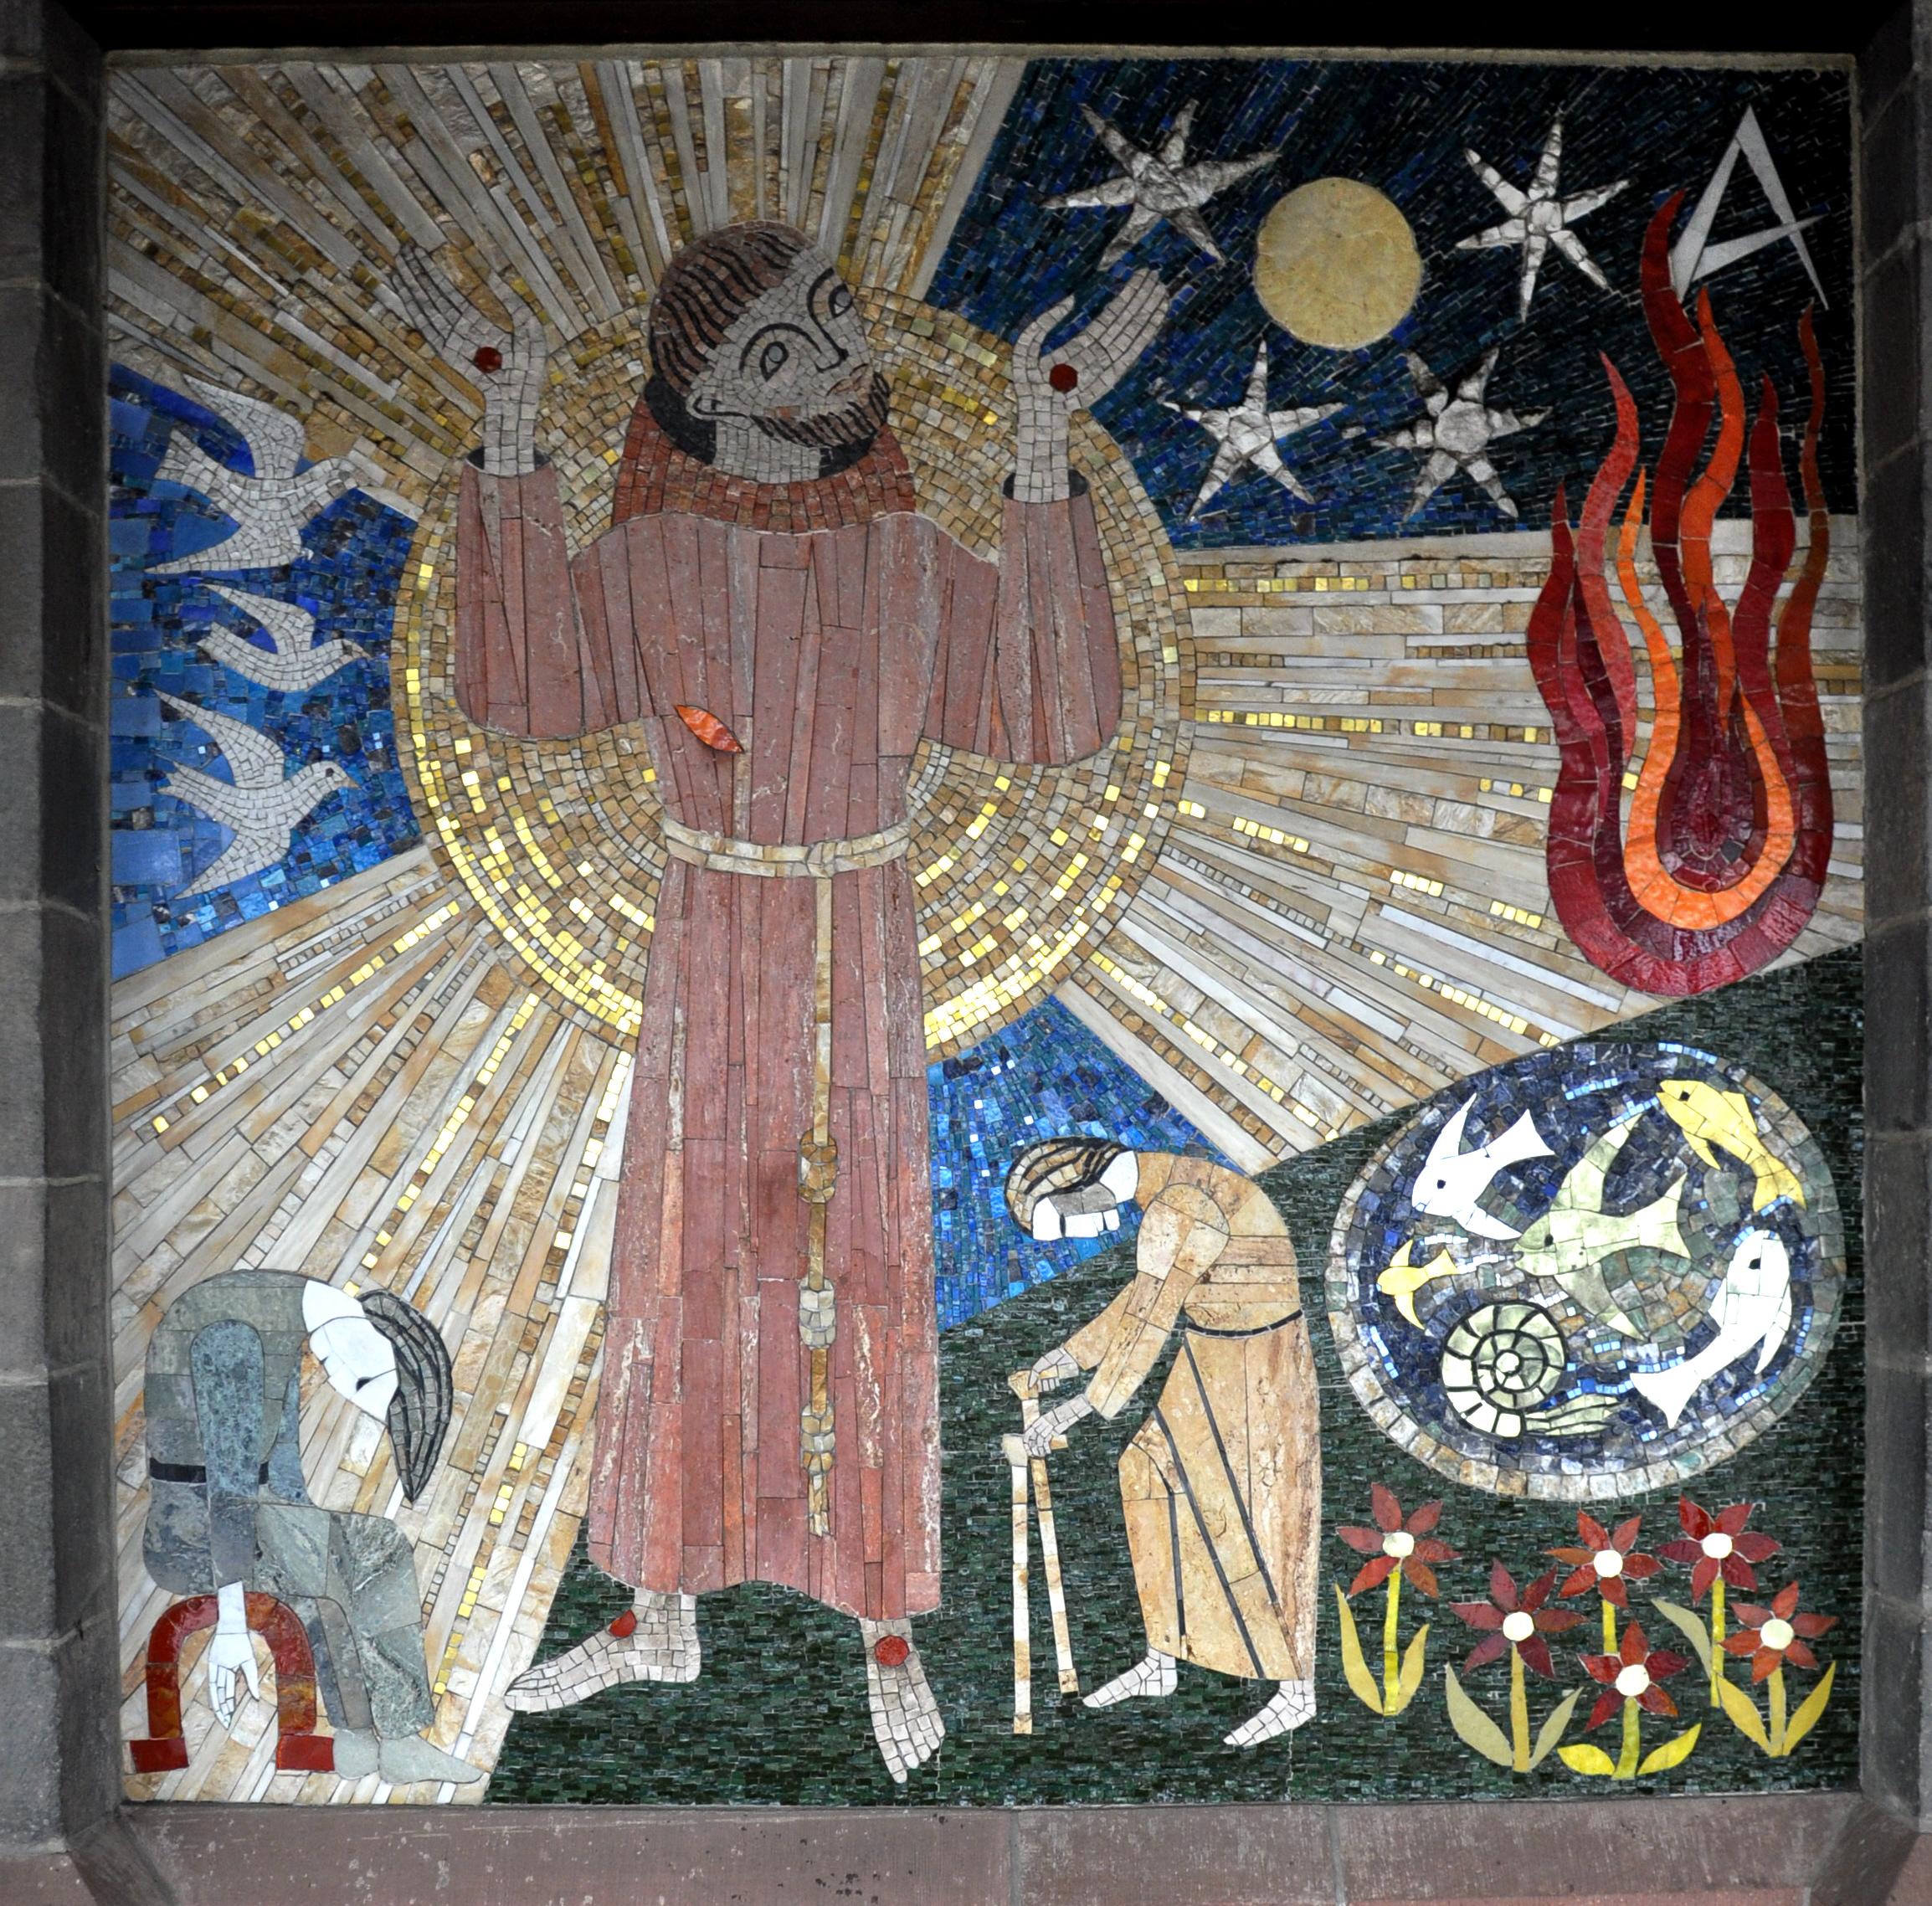 Frankfurt Liebfrauenkirche Innenhof Franziskus-Mosaik.jpg